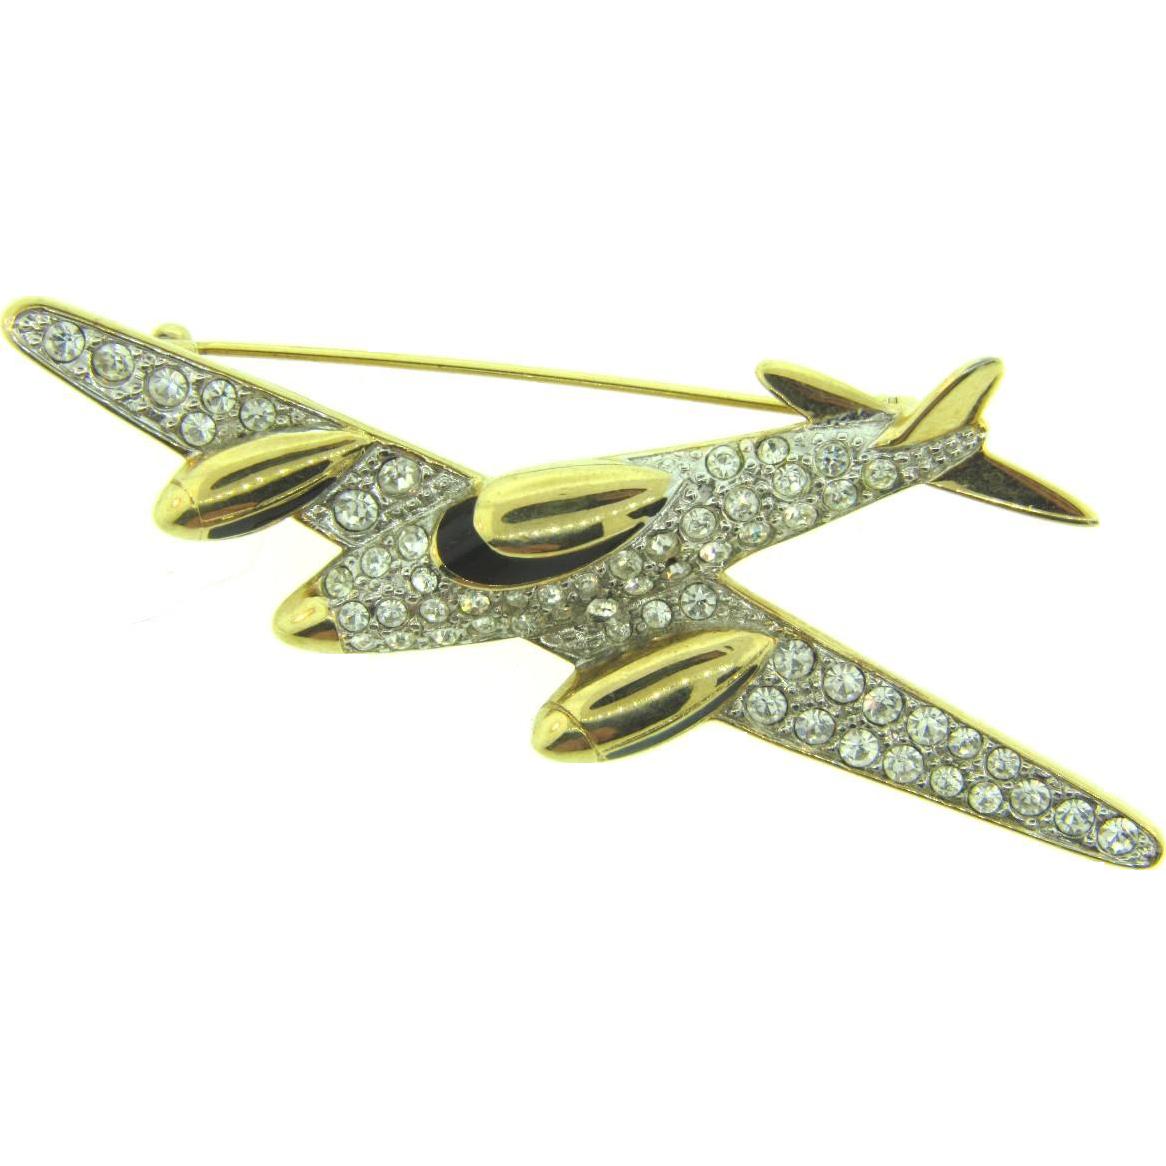 Signed Carolee figural airplane Brooch with crystal rhinestones and black enamel